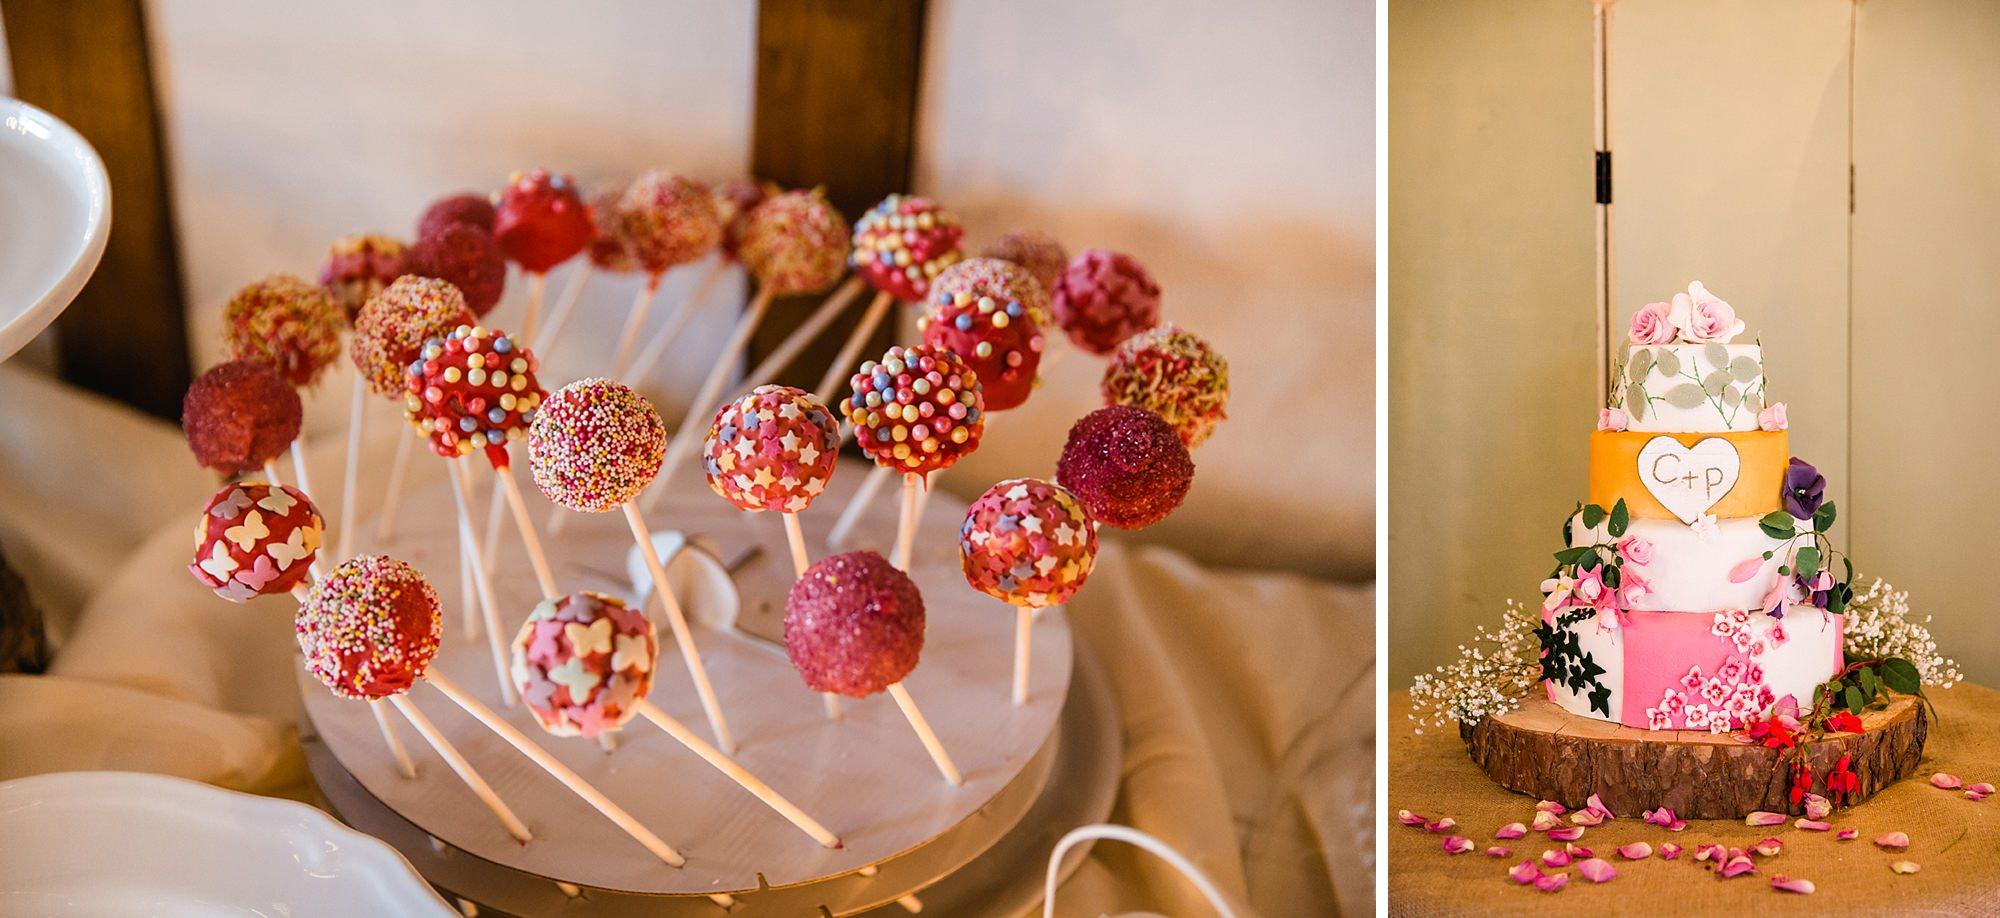 Marks Hall Estate wedding photography wedding cake and cake pops